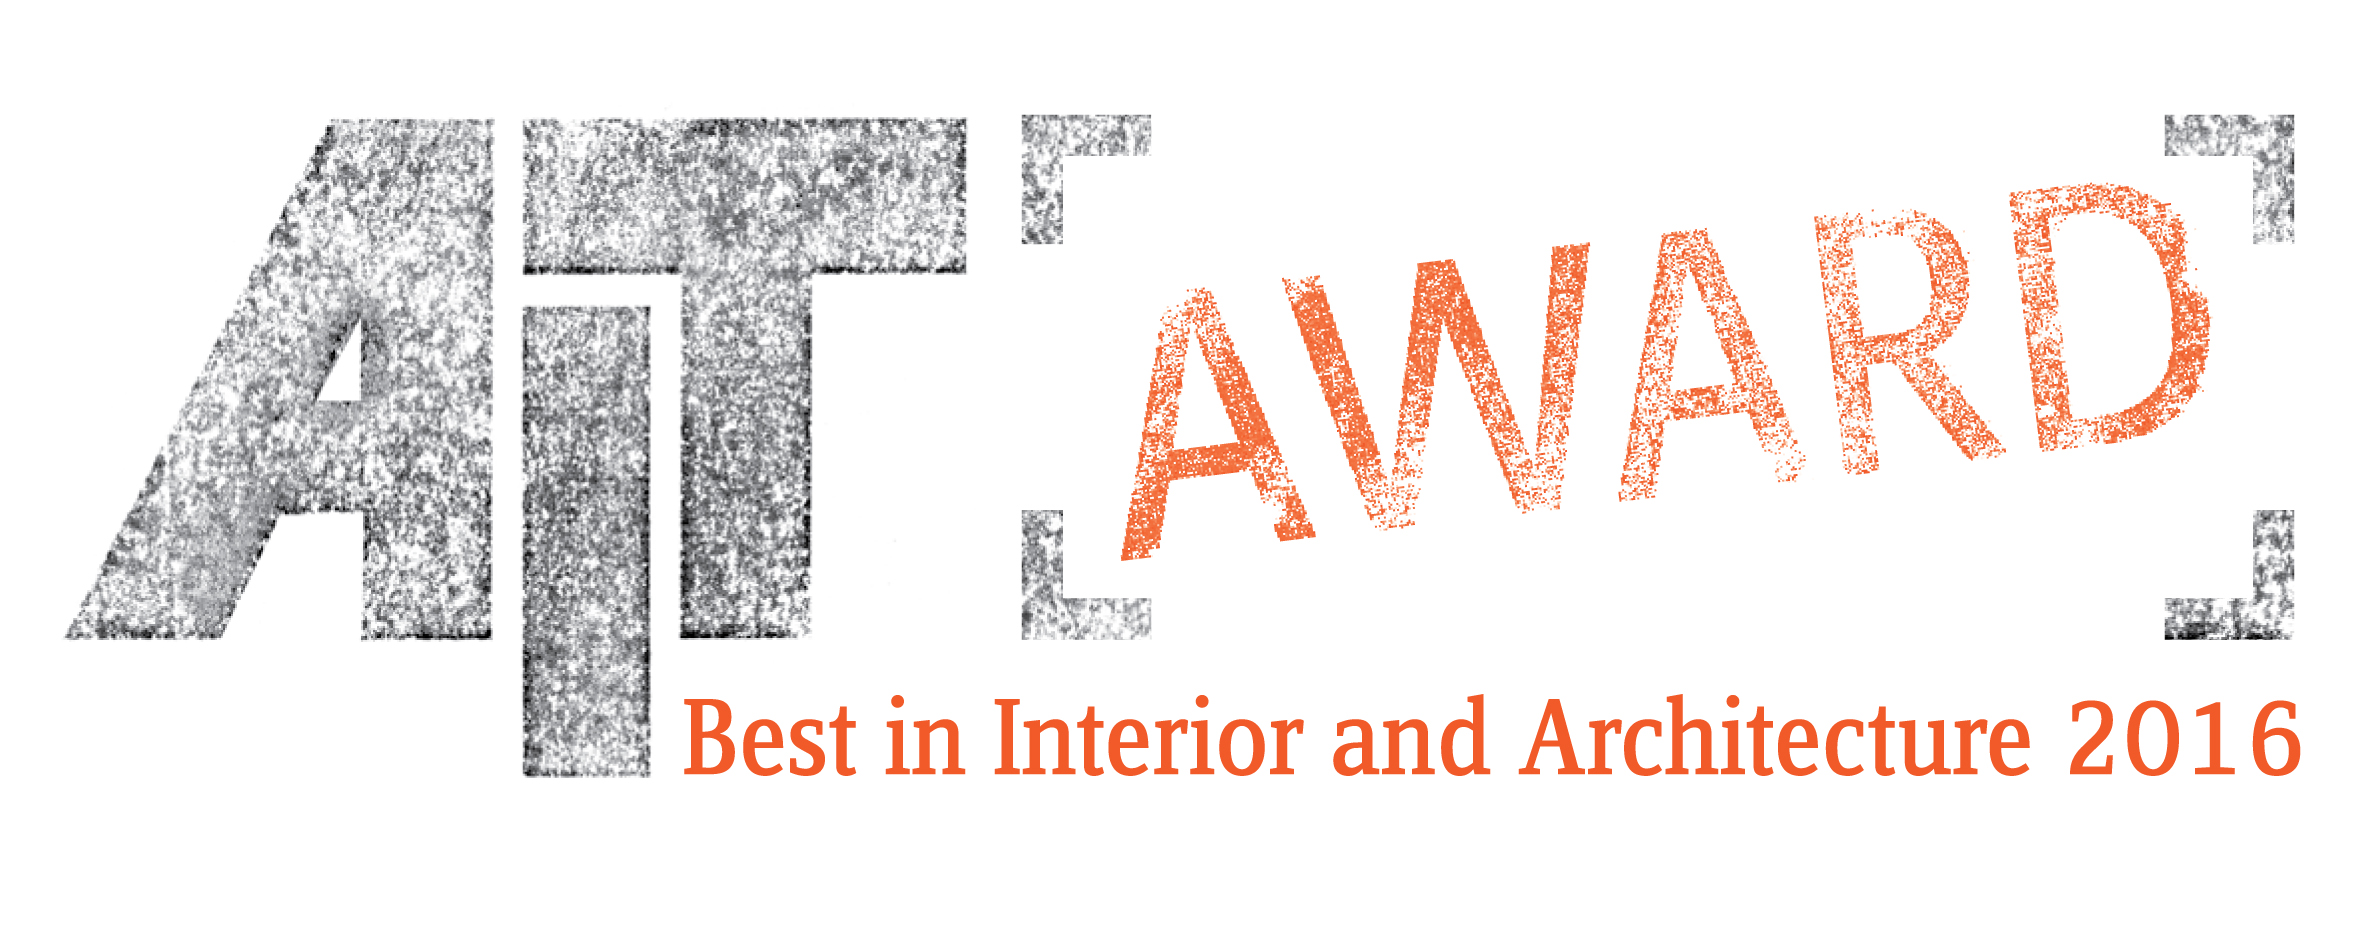 AIT Award 2016 Andreas Heller Architects Designers Gewinnt 2 Preis Fur Das Europaische Hansemuseum